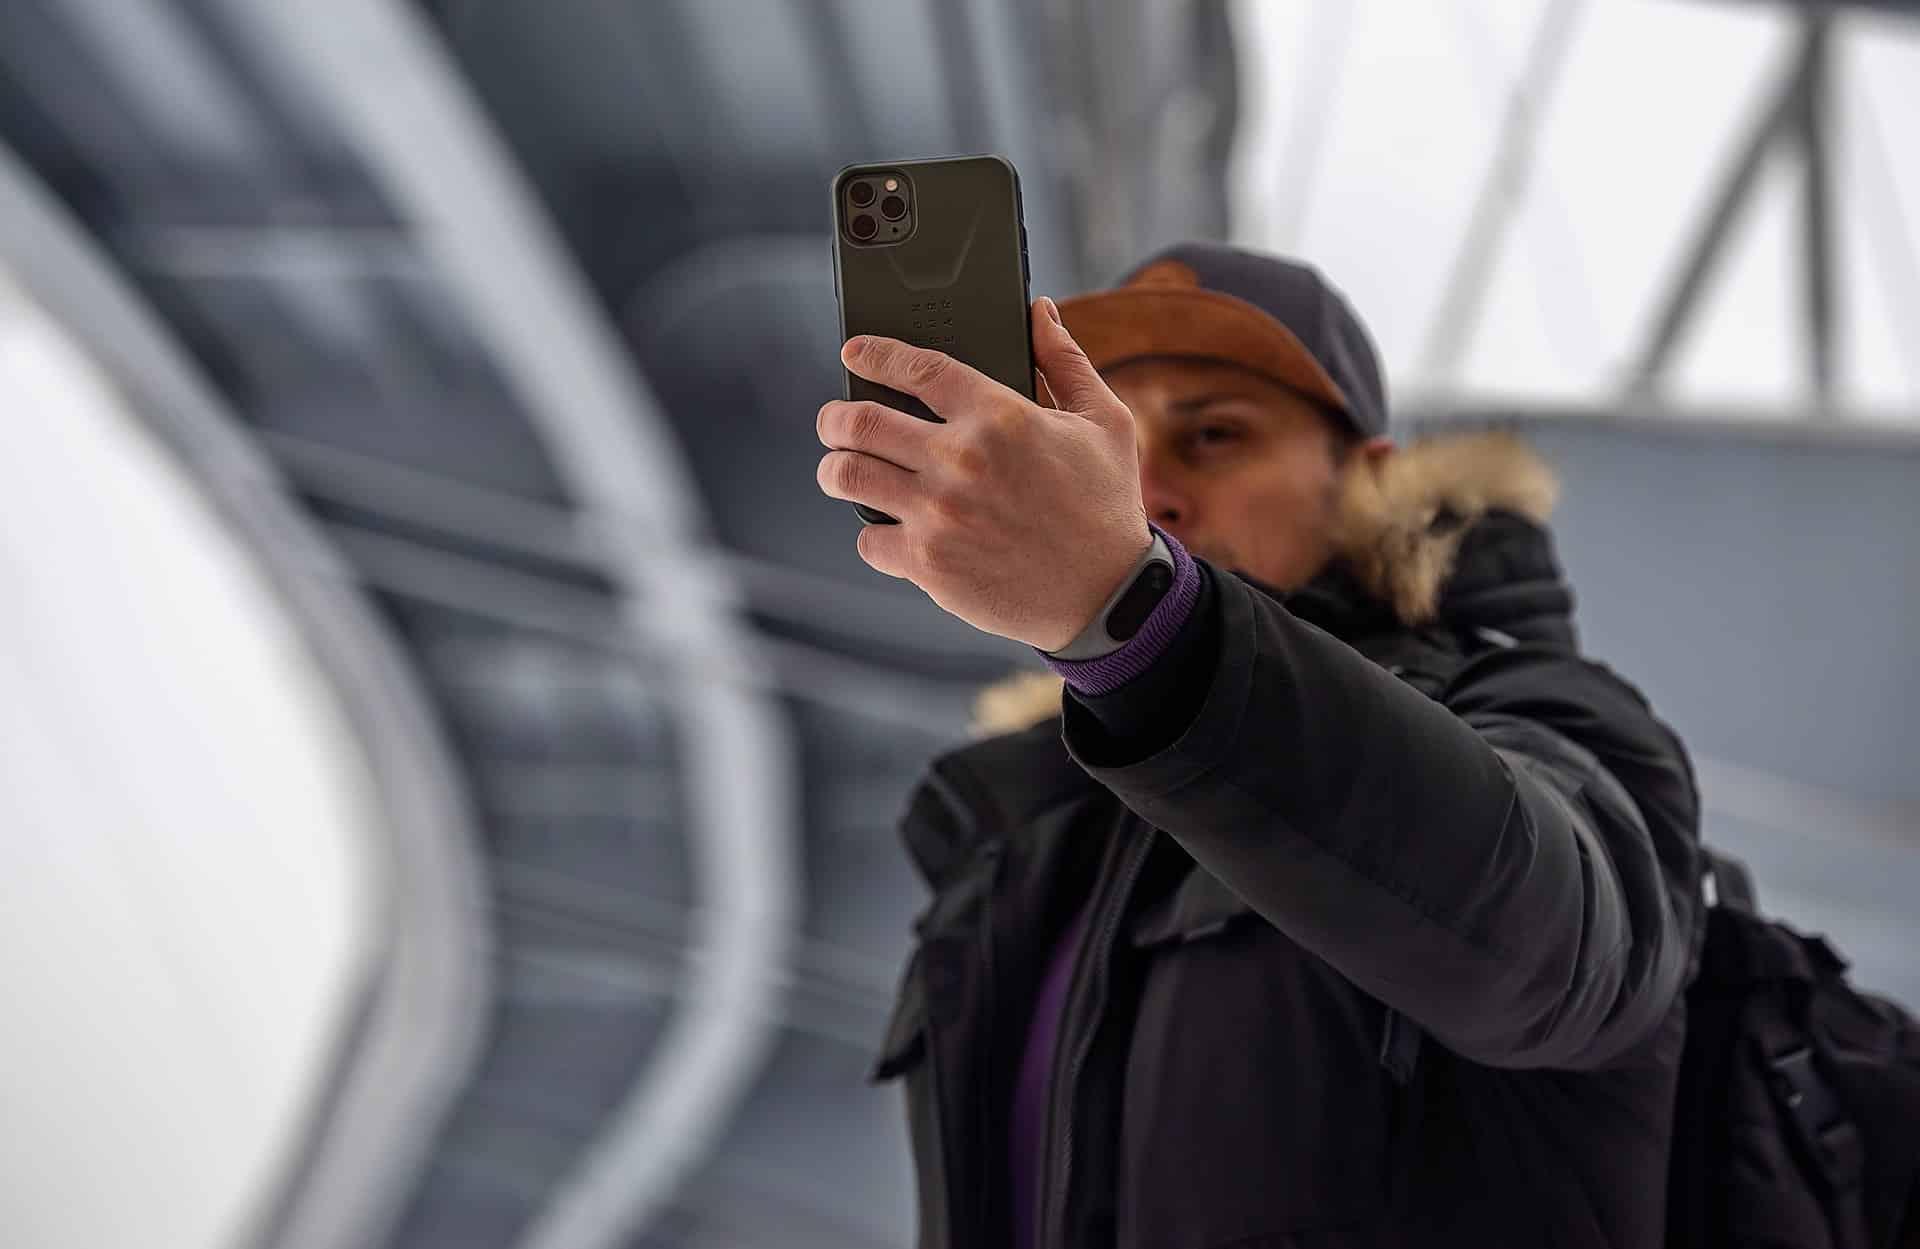 Phone Hacking Protect Header Image